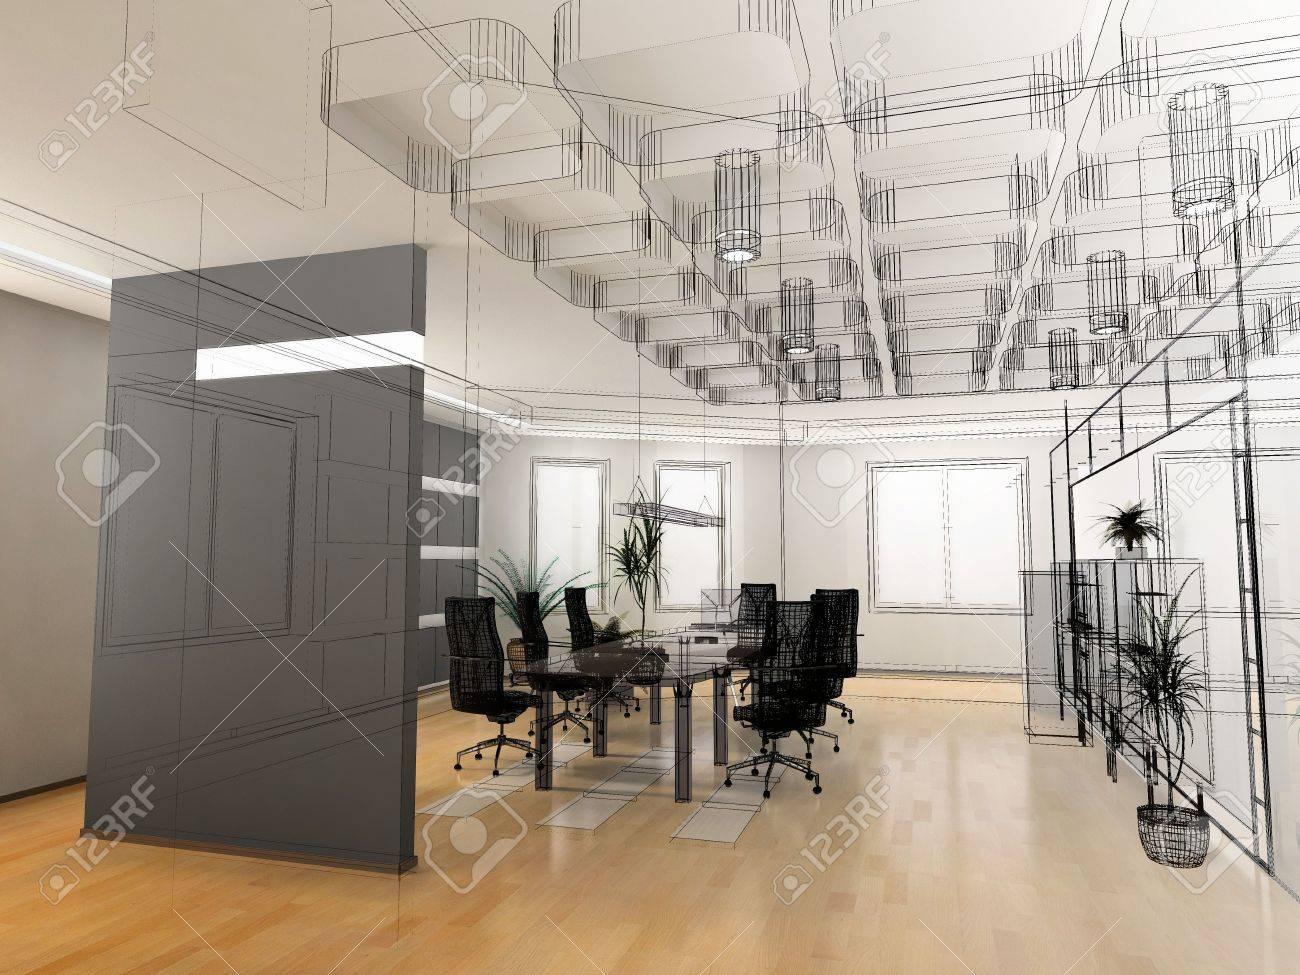 modern office interior design. Stock Photo - The Modern Office Interior Design Sketch (3d Render)